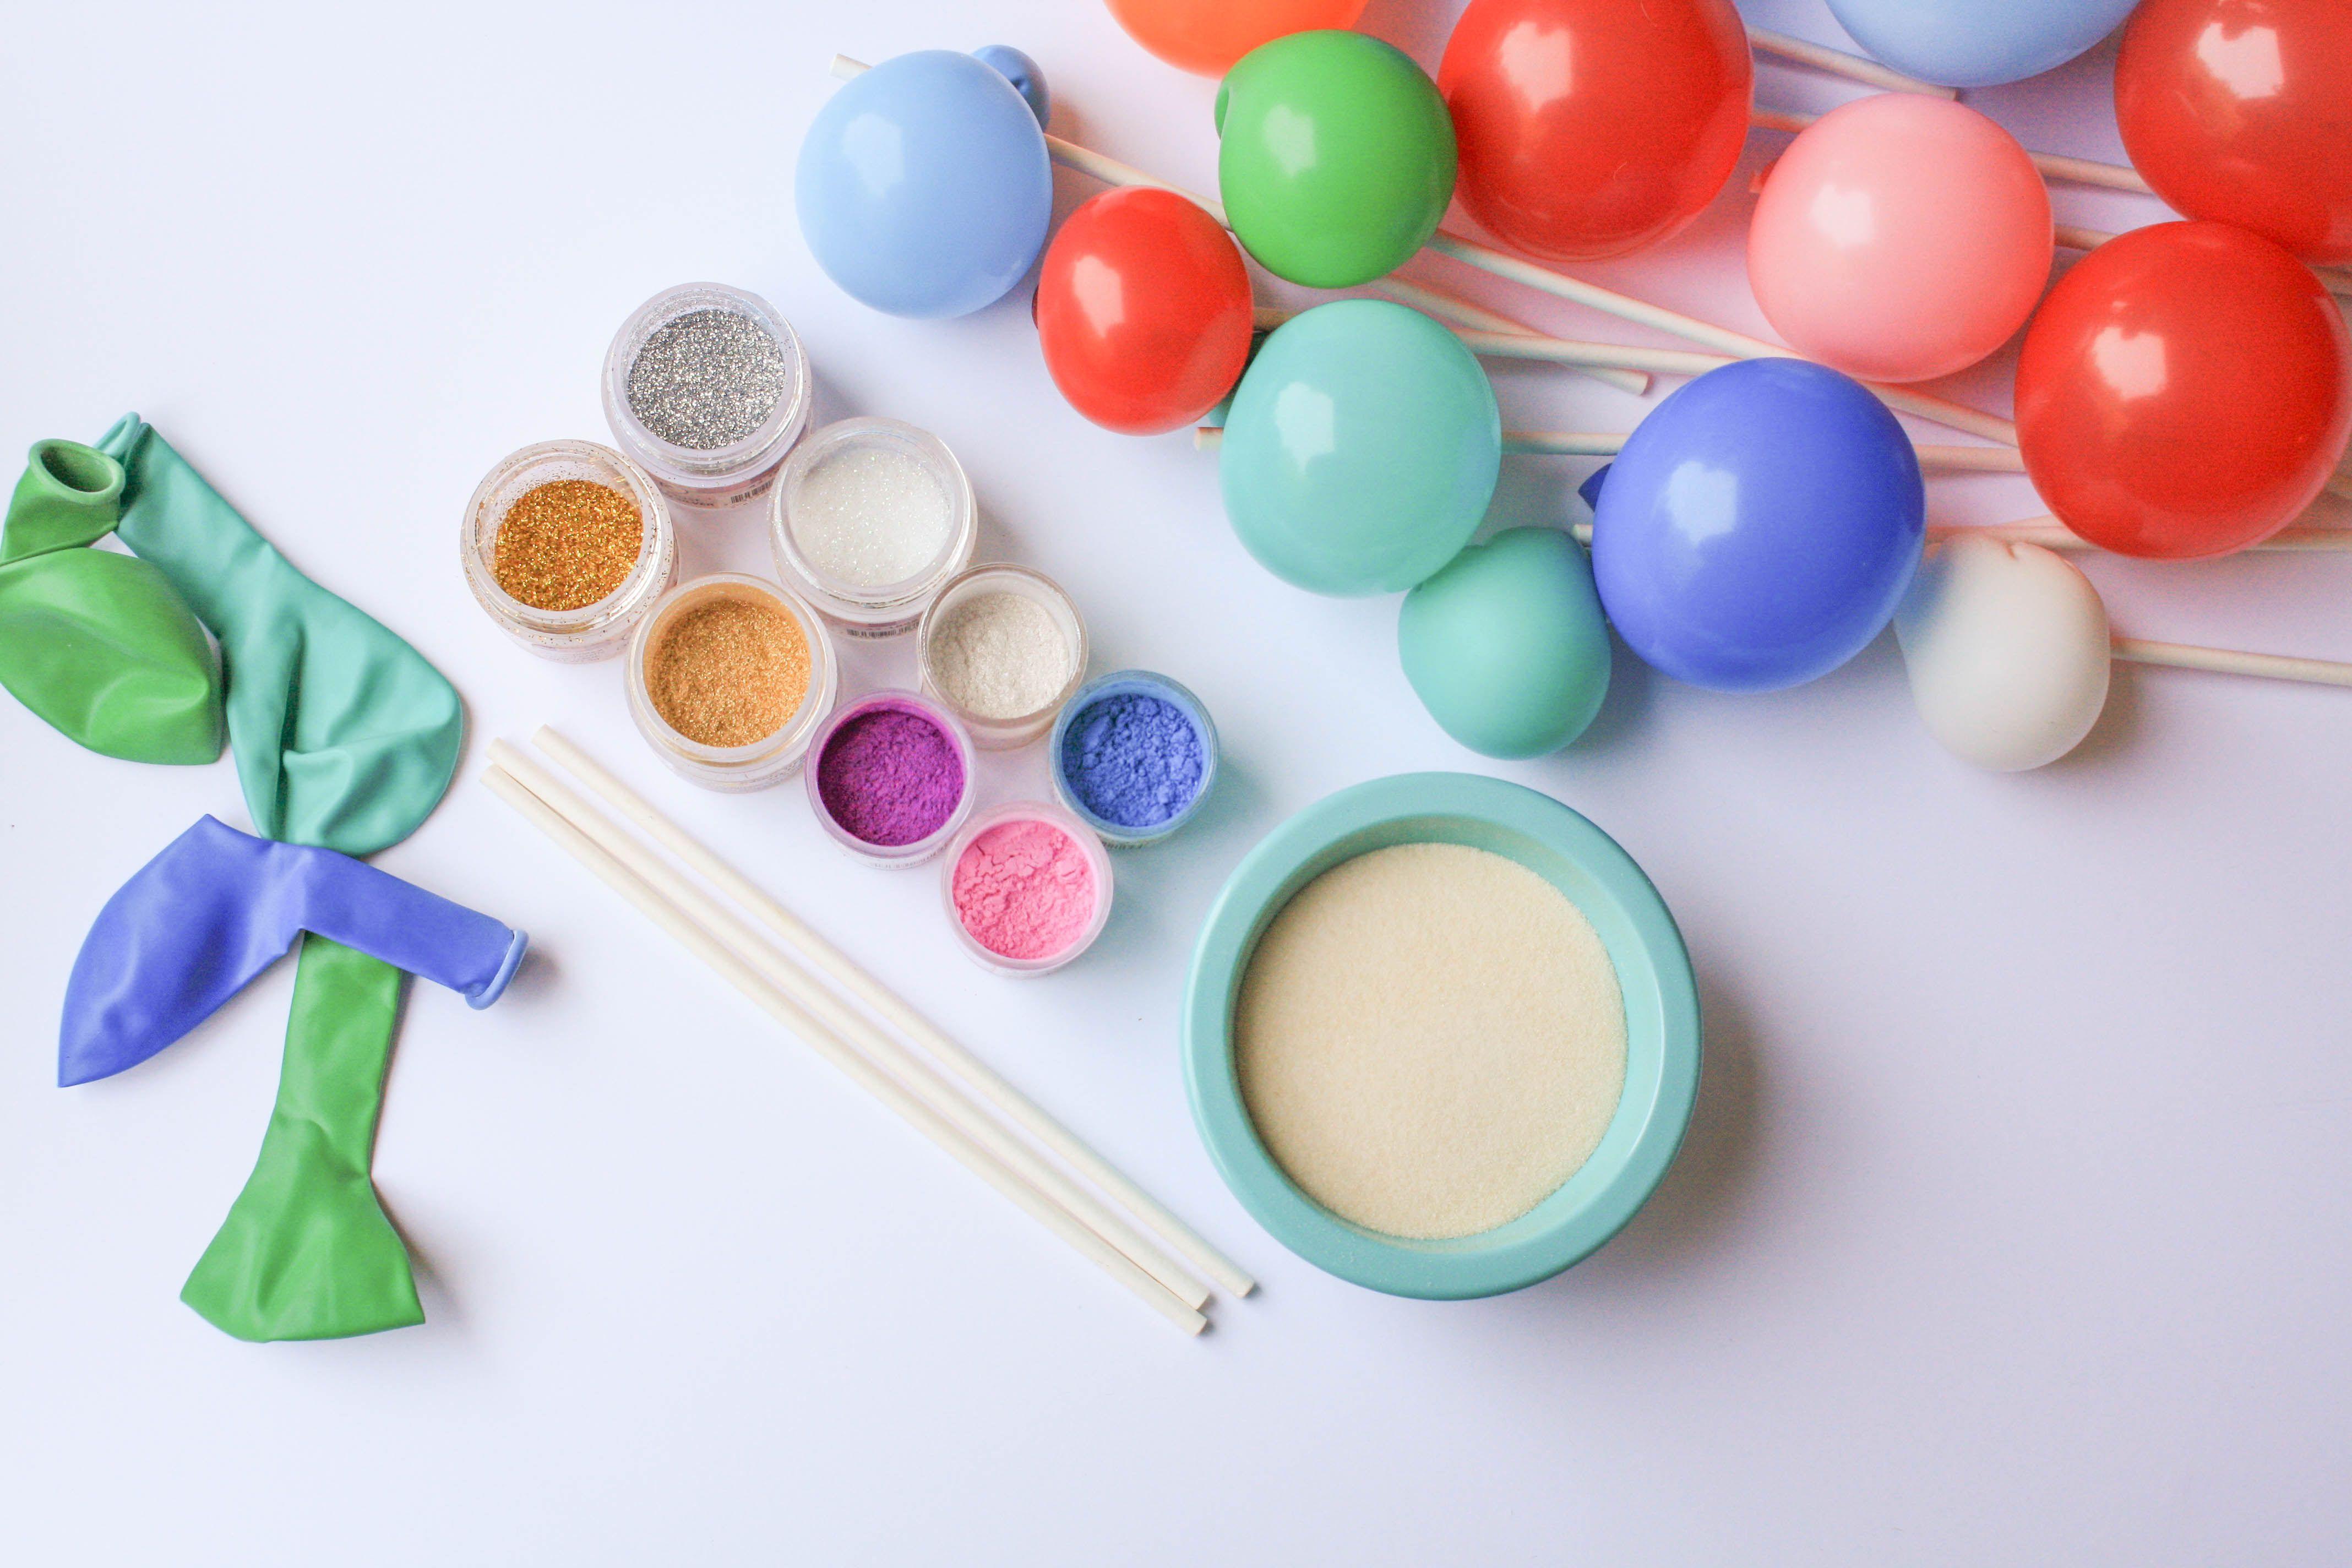 Express your creativity gelatin bubbles